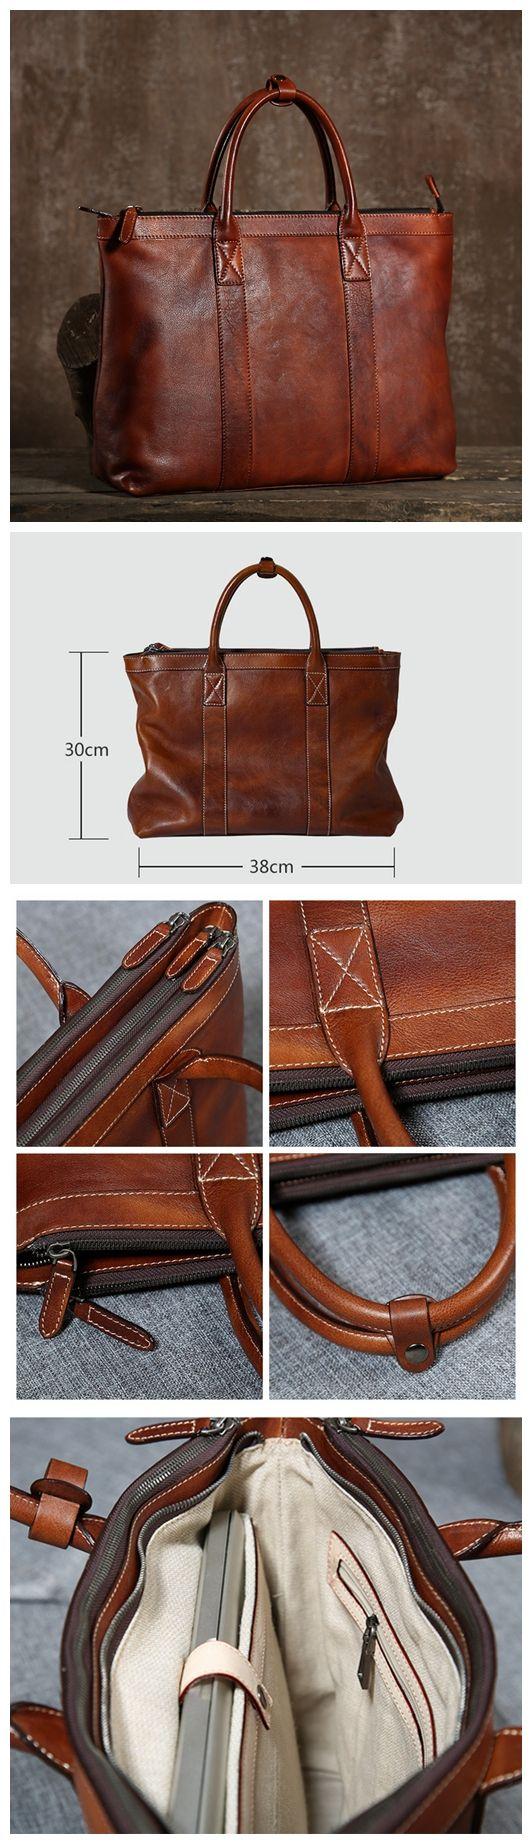 Handmade Leather Briefcase, High Quality Business Bag, Leather Laptop Bag GLT003